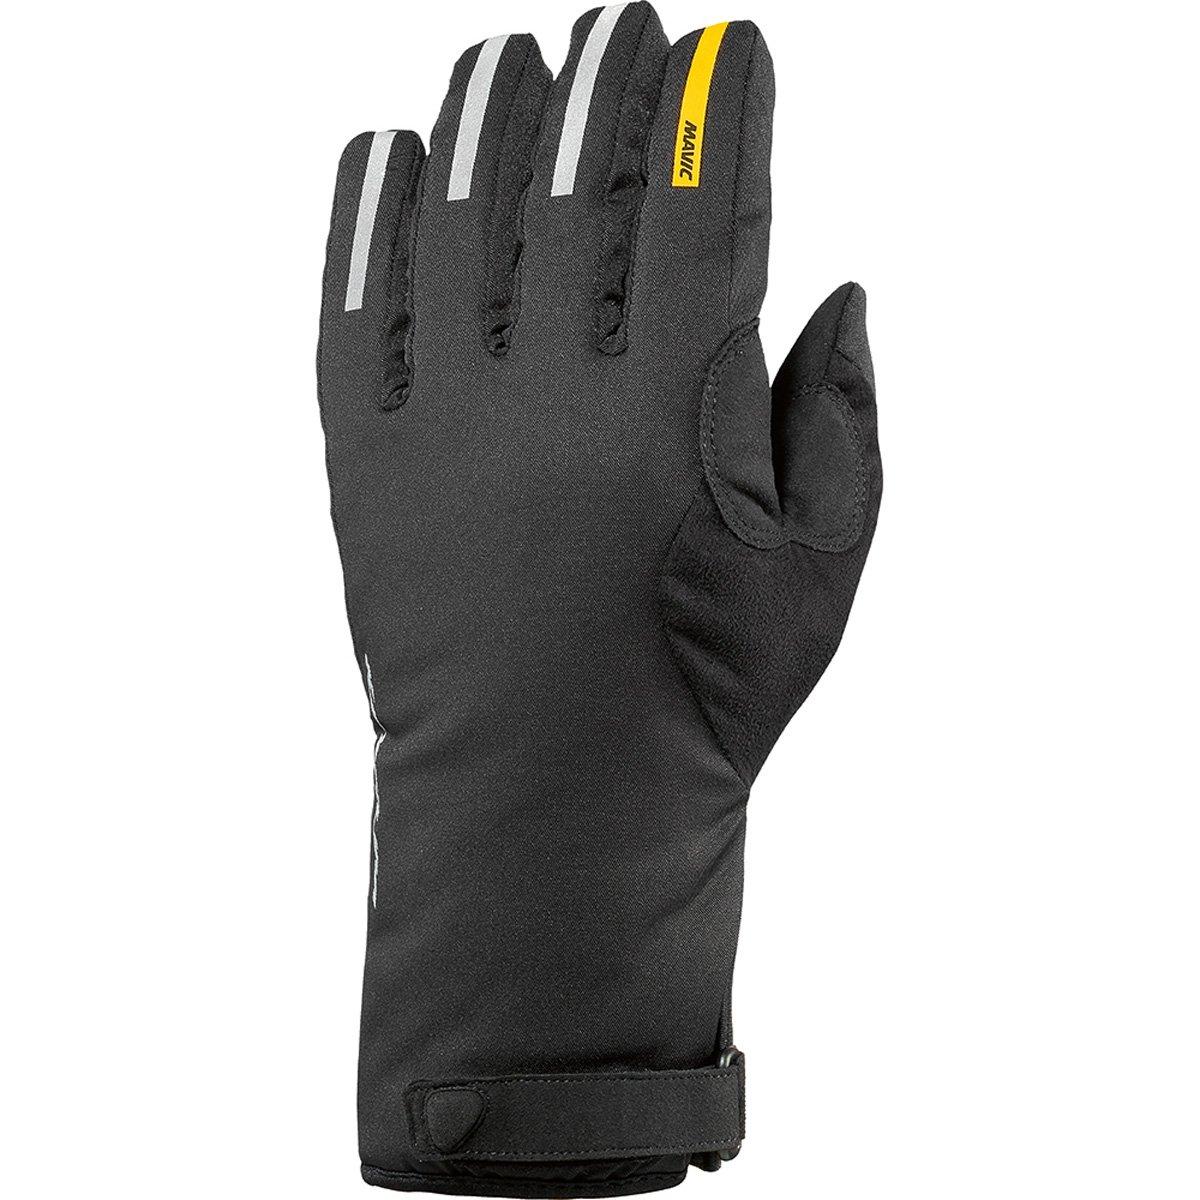 Mavic Ksyrium Pro Thermo Fahrrad Handschuhe schwarz 2018